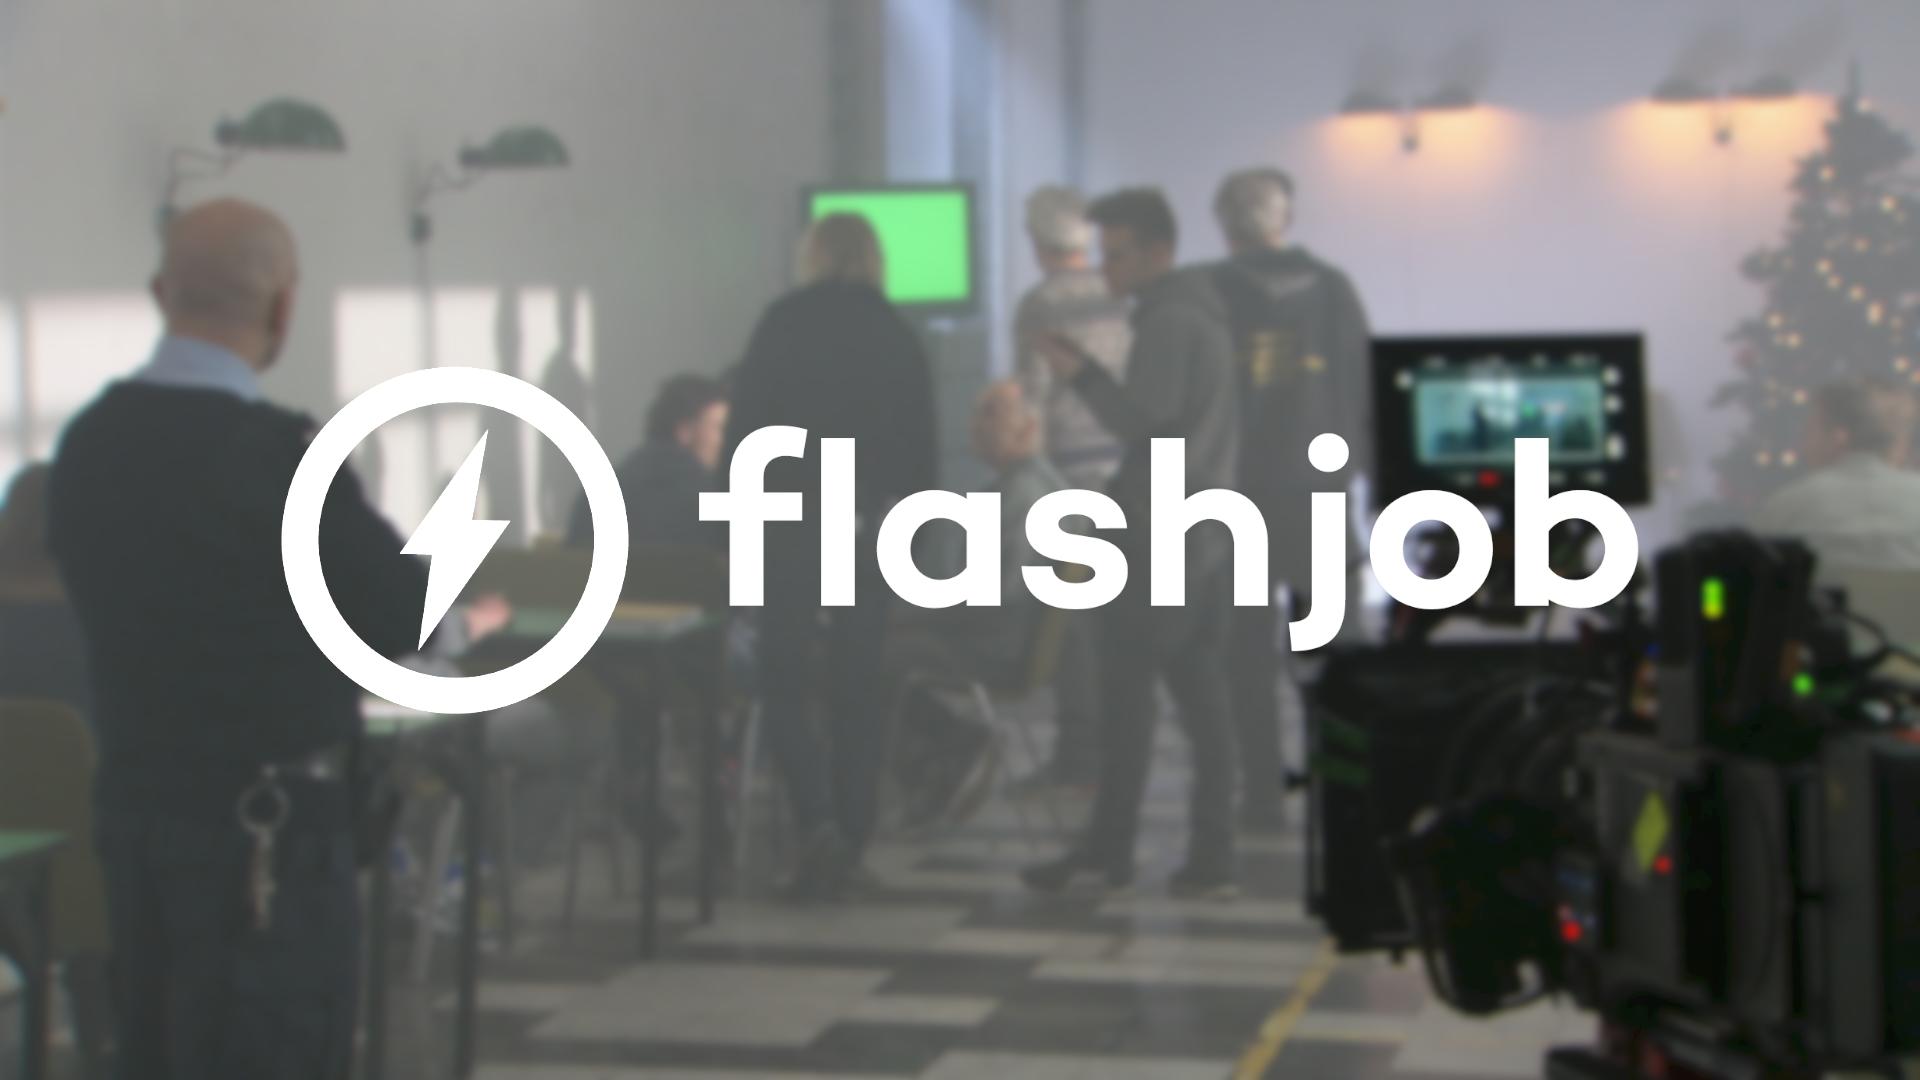 flashjob